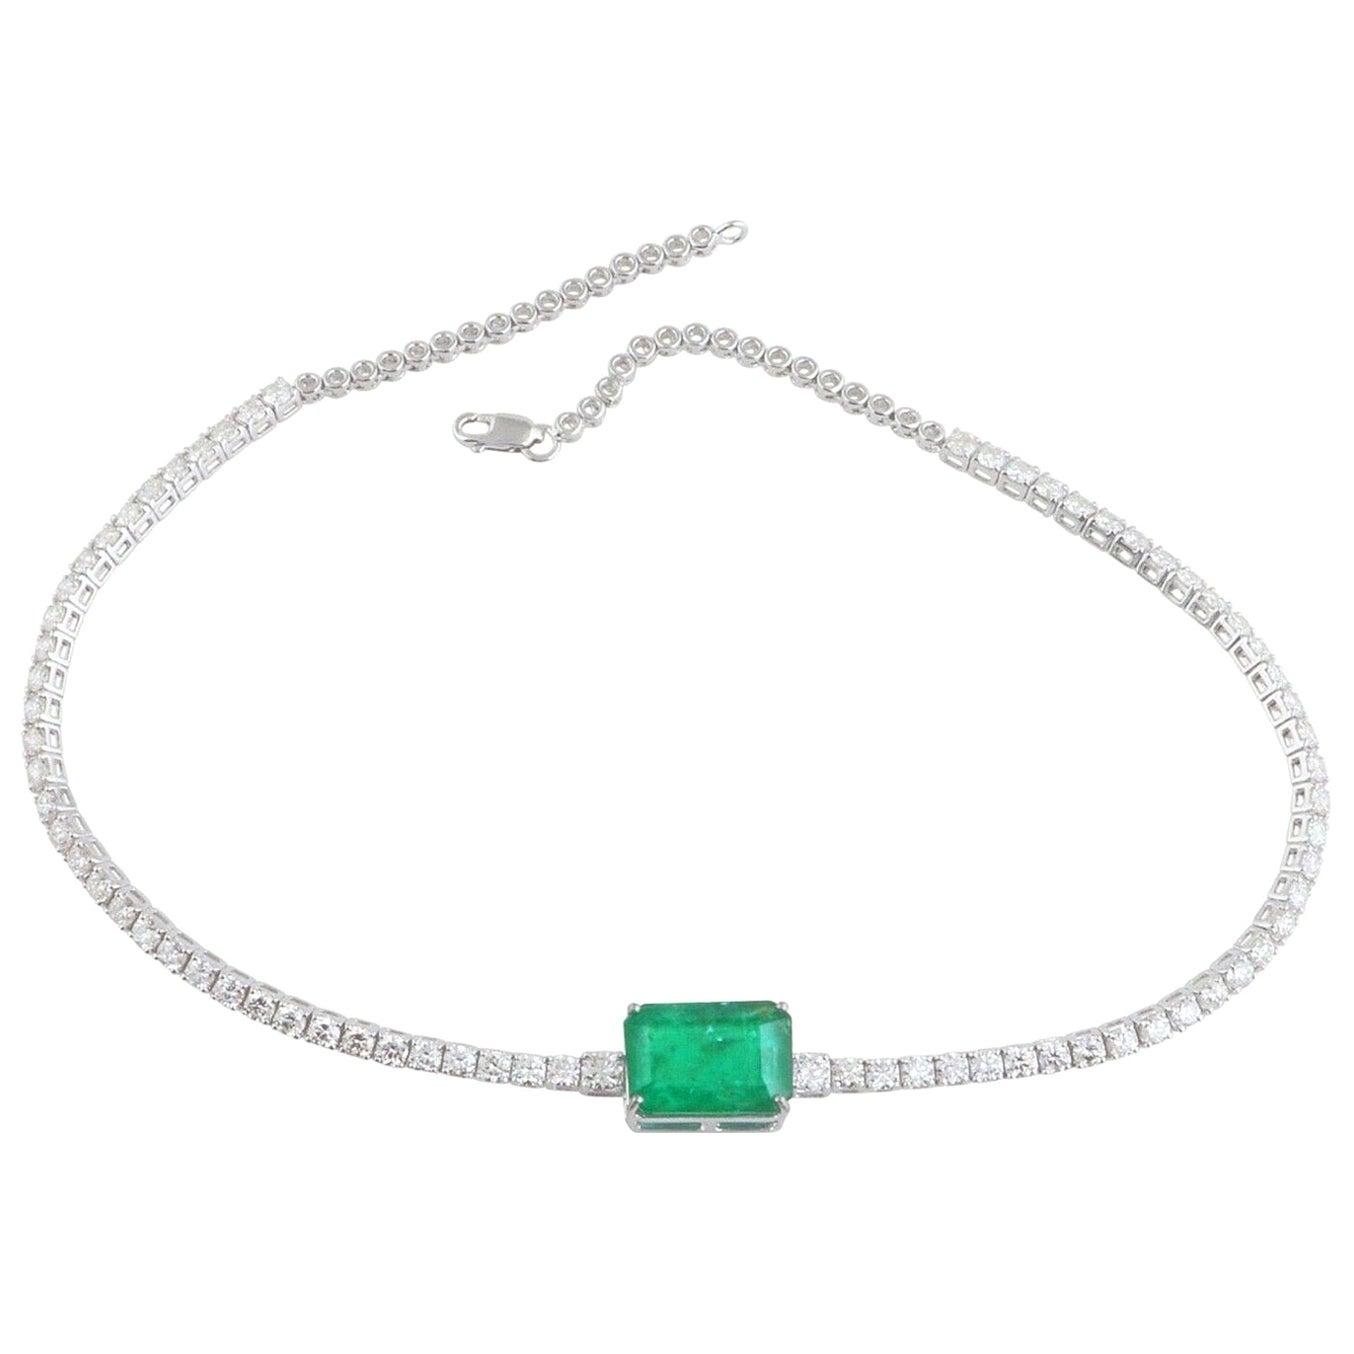 8.10 Carat Emerald 18 Karat White Gold Diamond Choker Necklace